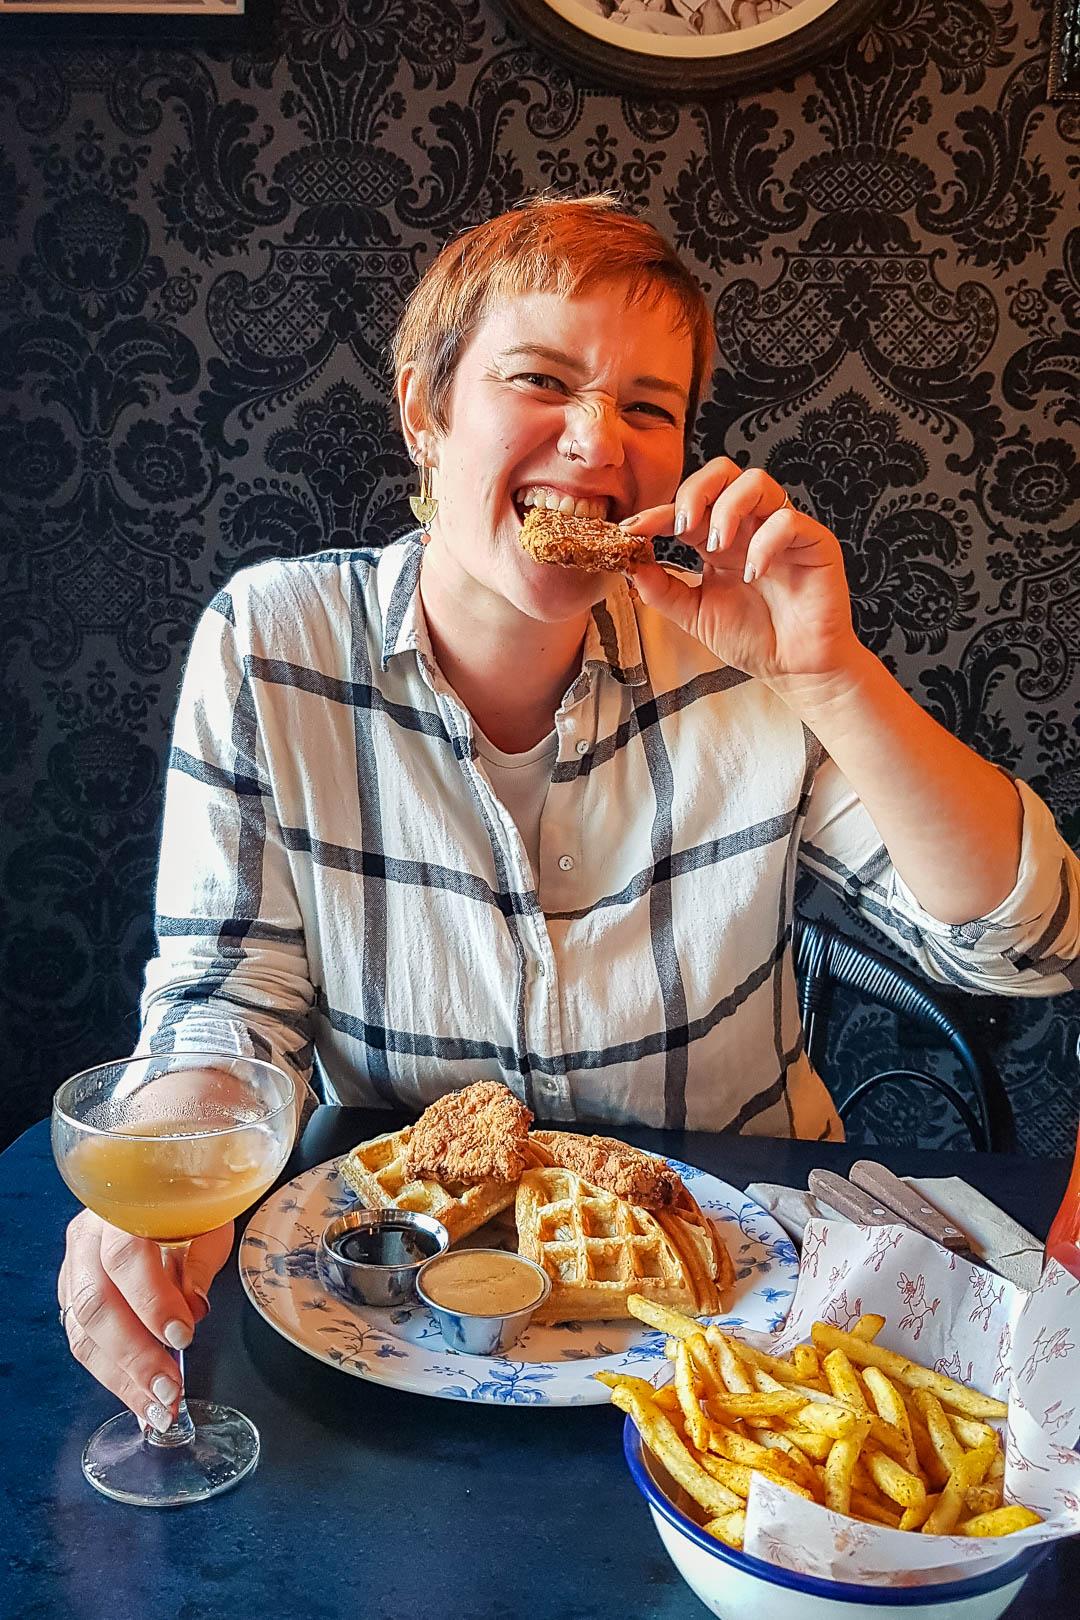 Vegan chicken waffles and burgers at Absurd Bird Glasgow